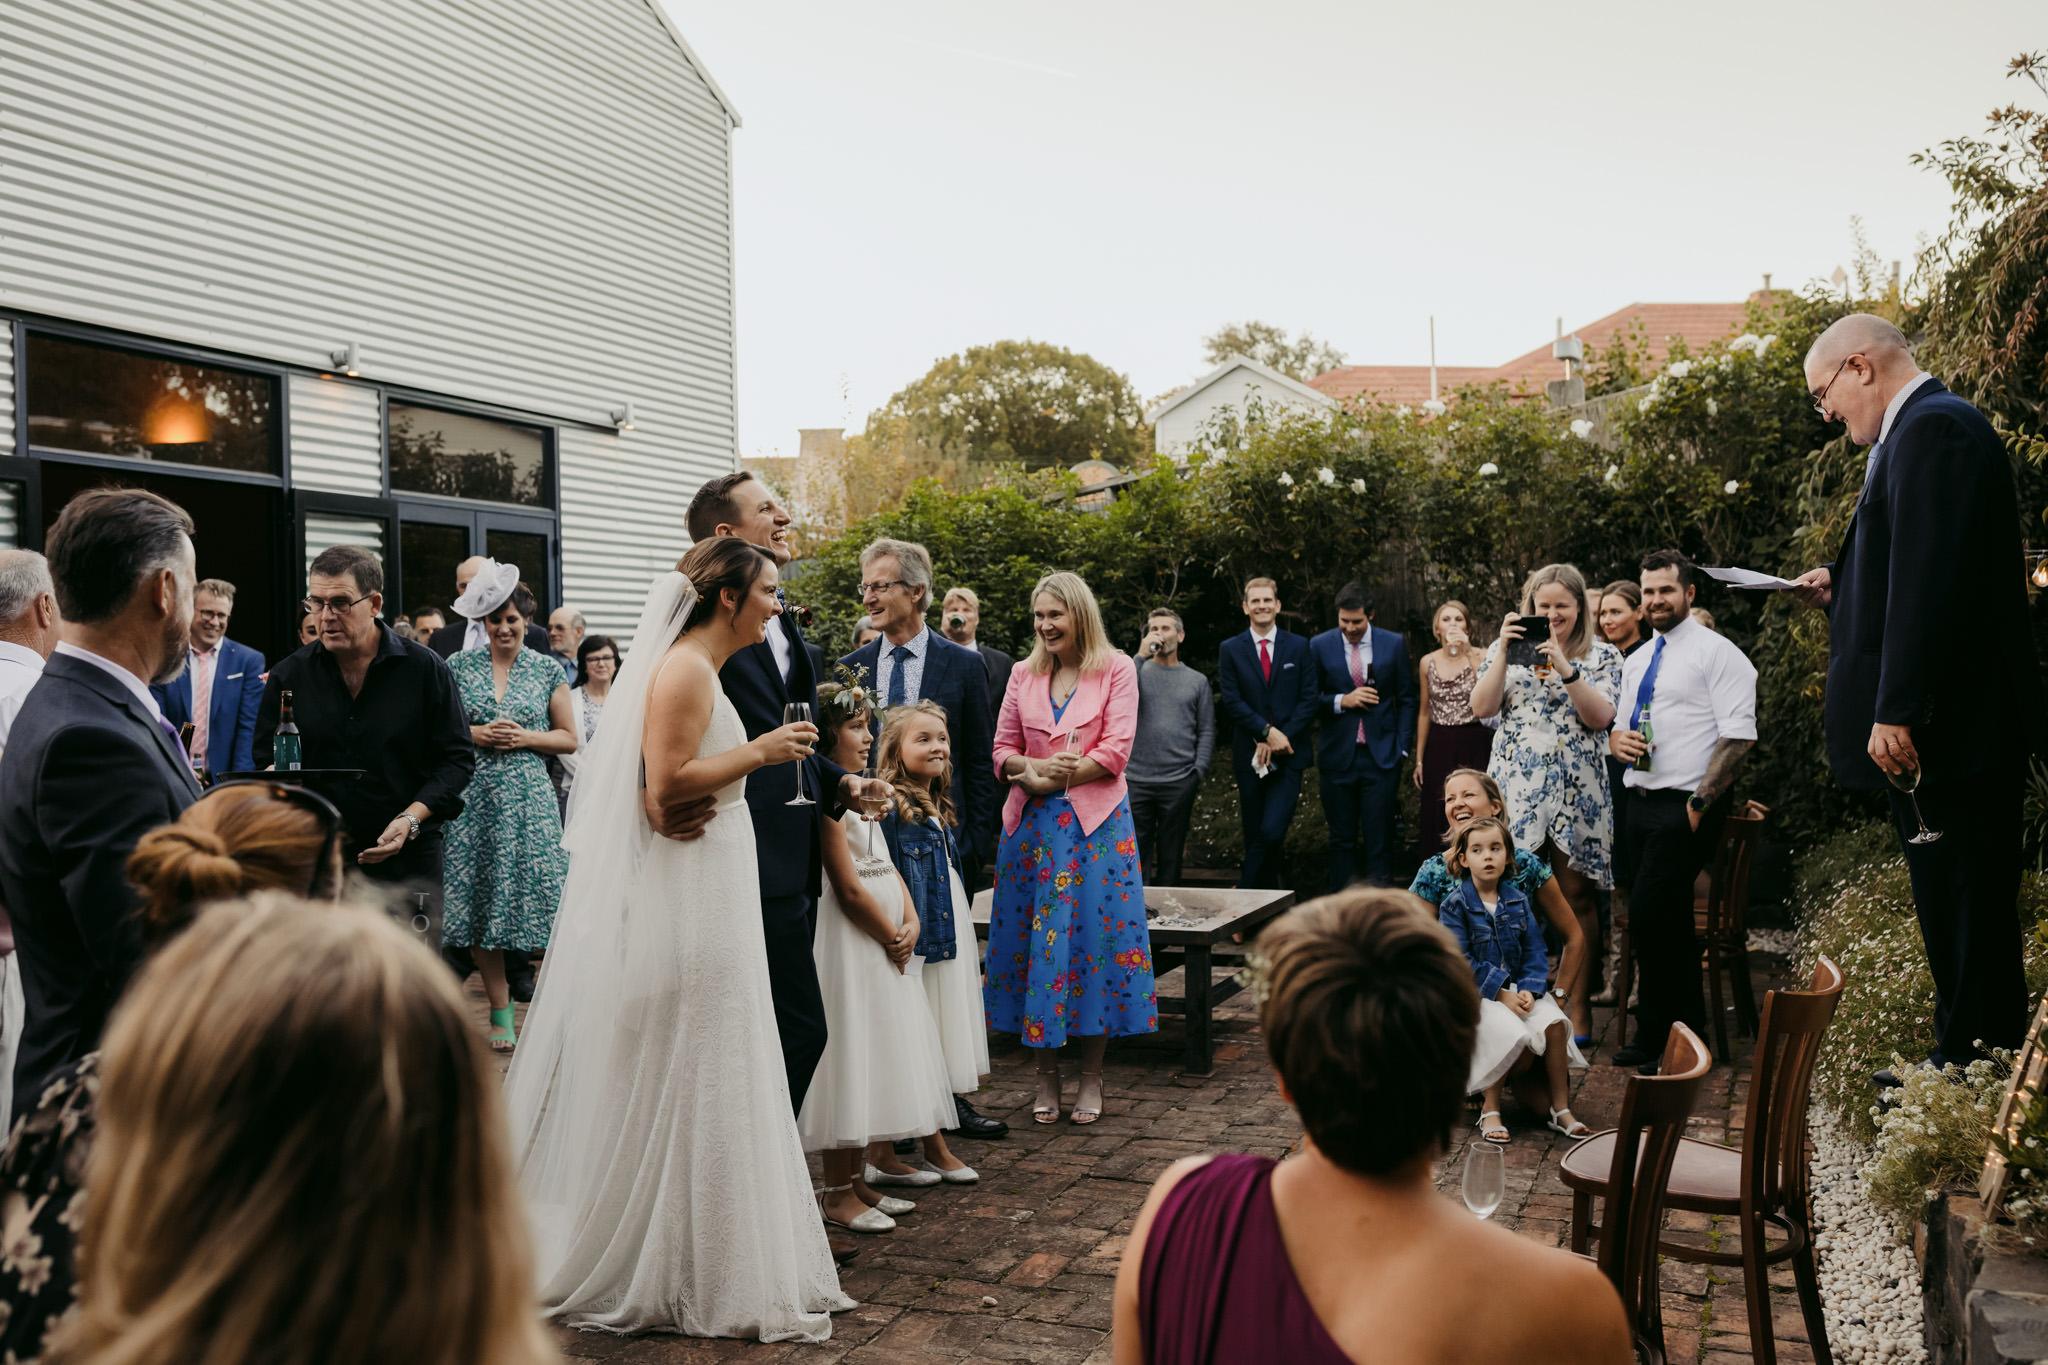 Erin Latimore Mudgee Canberra Wedding Photographer ROSEBANK GUESTHOUSE OLD THEATRE TONIC MILLTHORPE_614.JPG